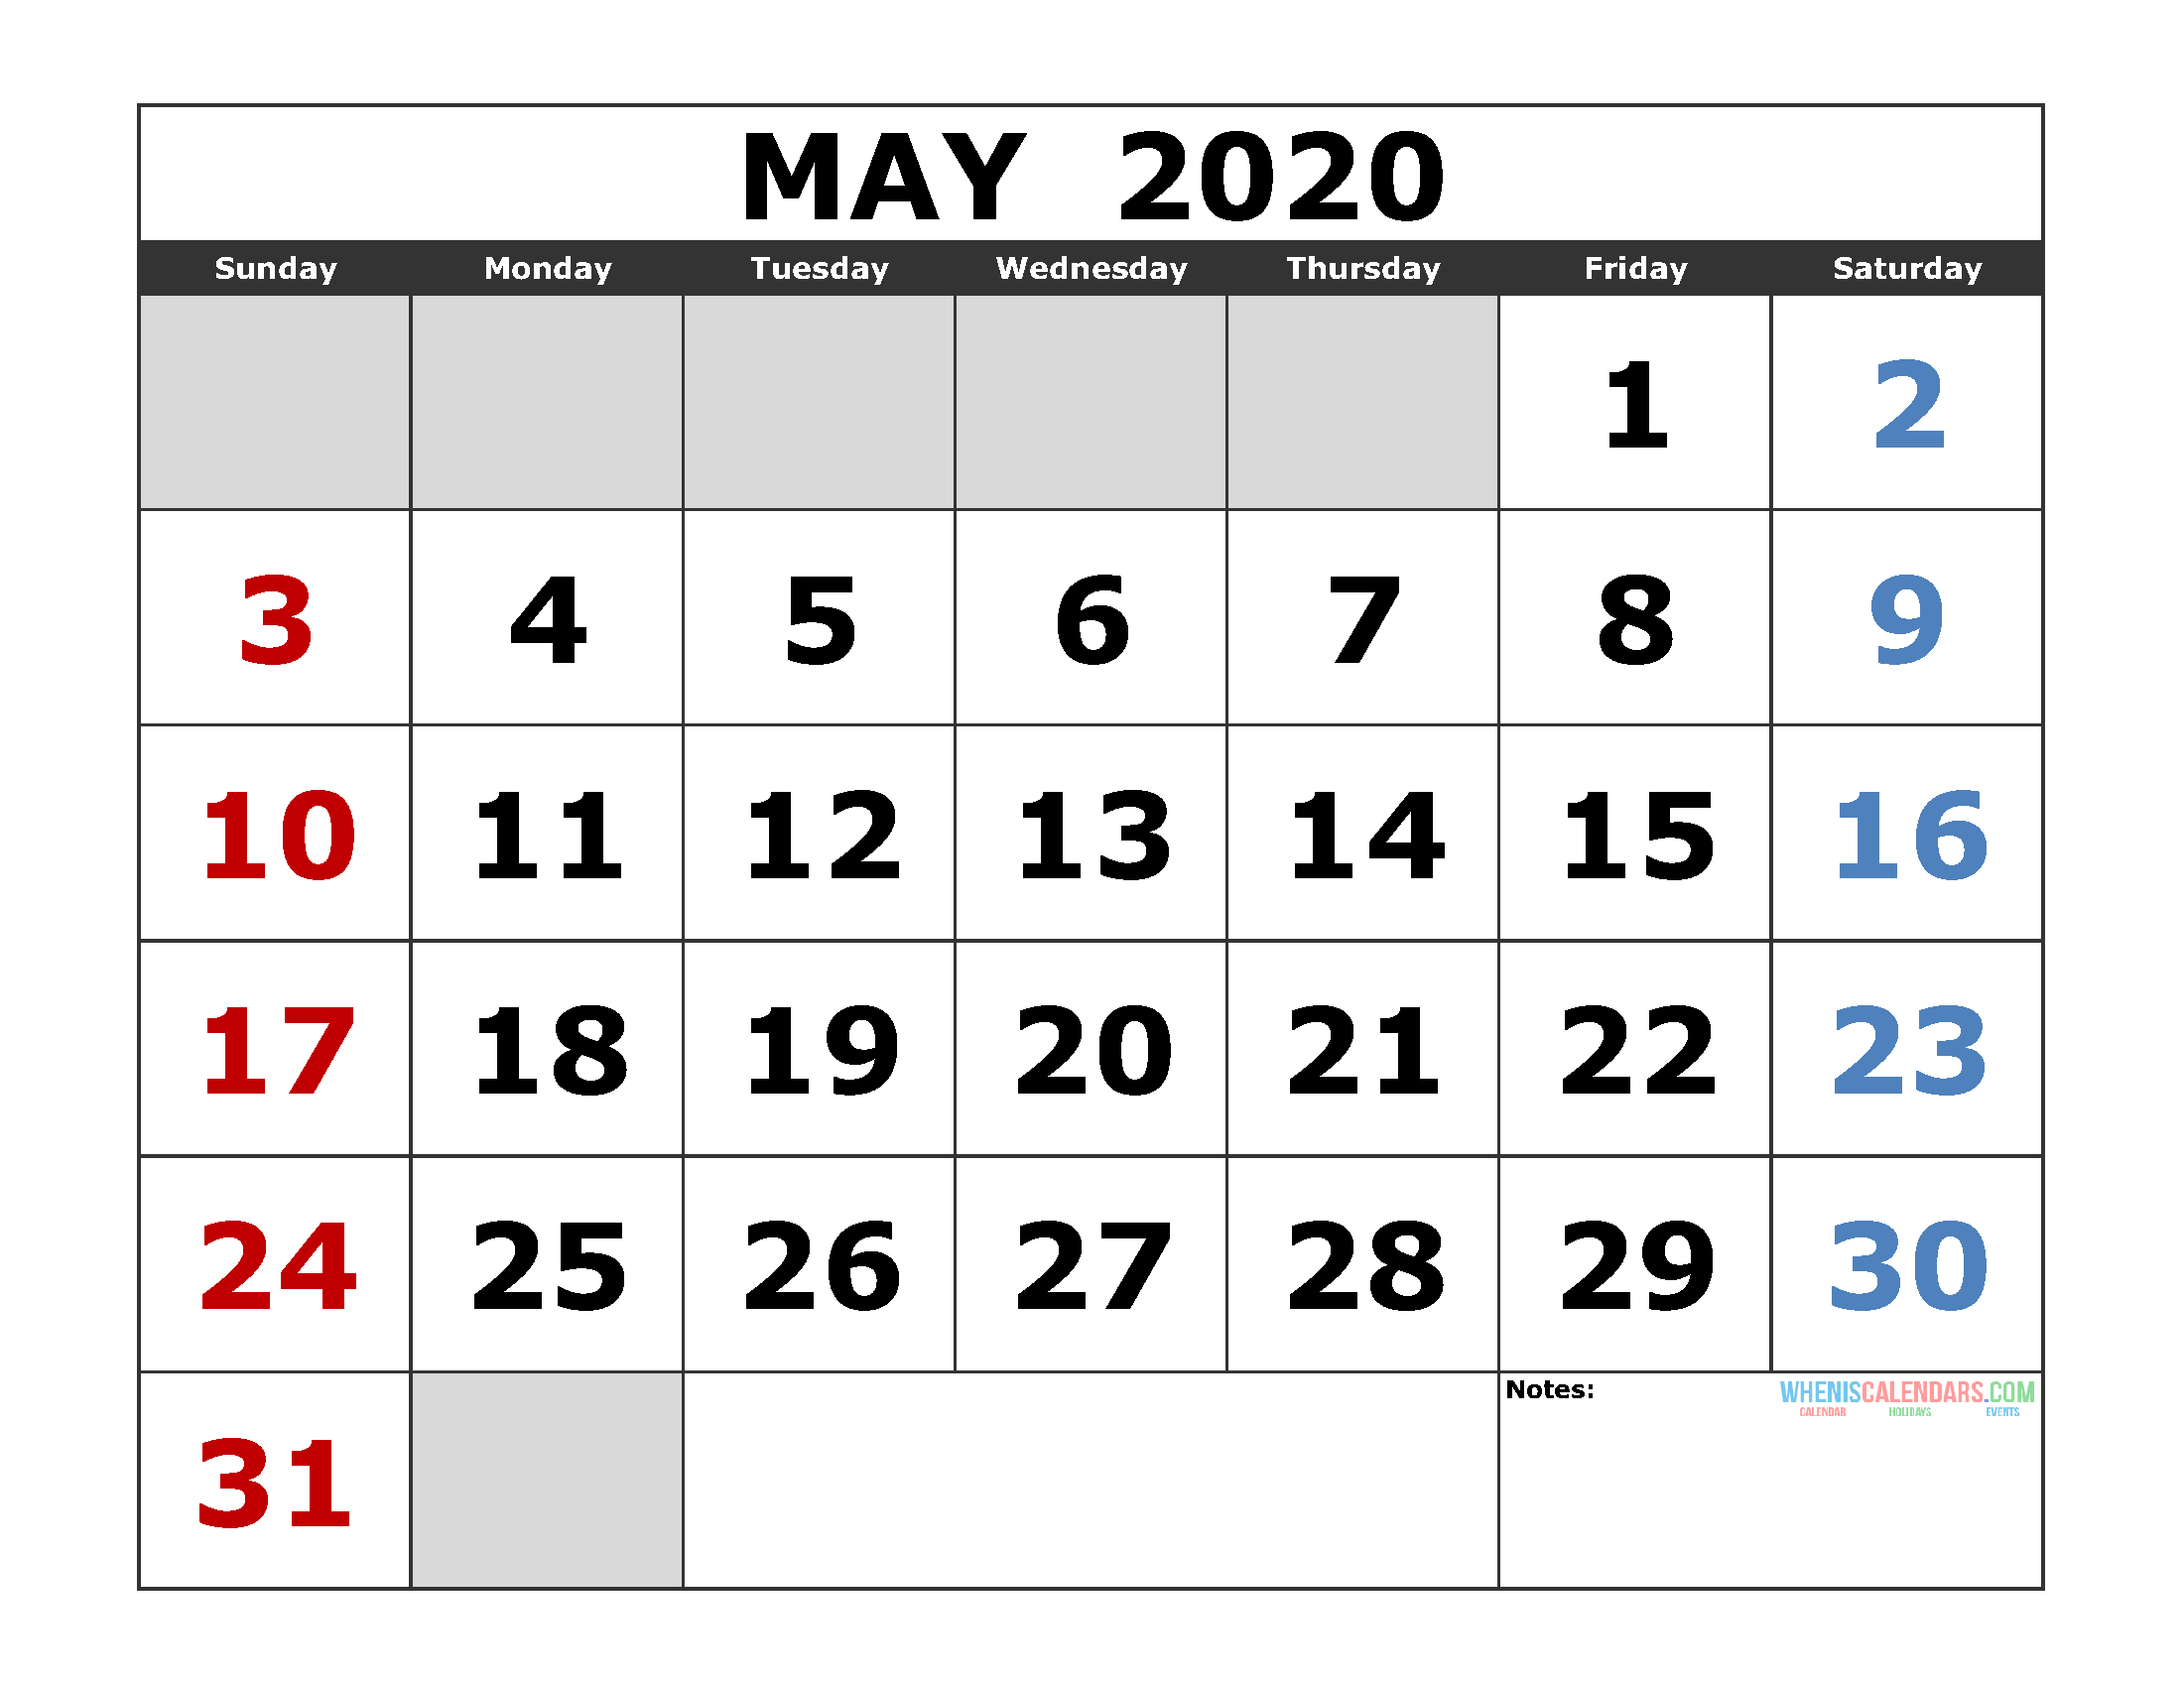 may 2020 calendar png